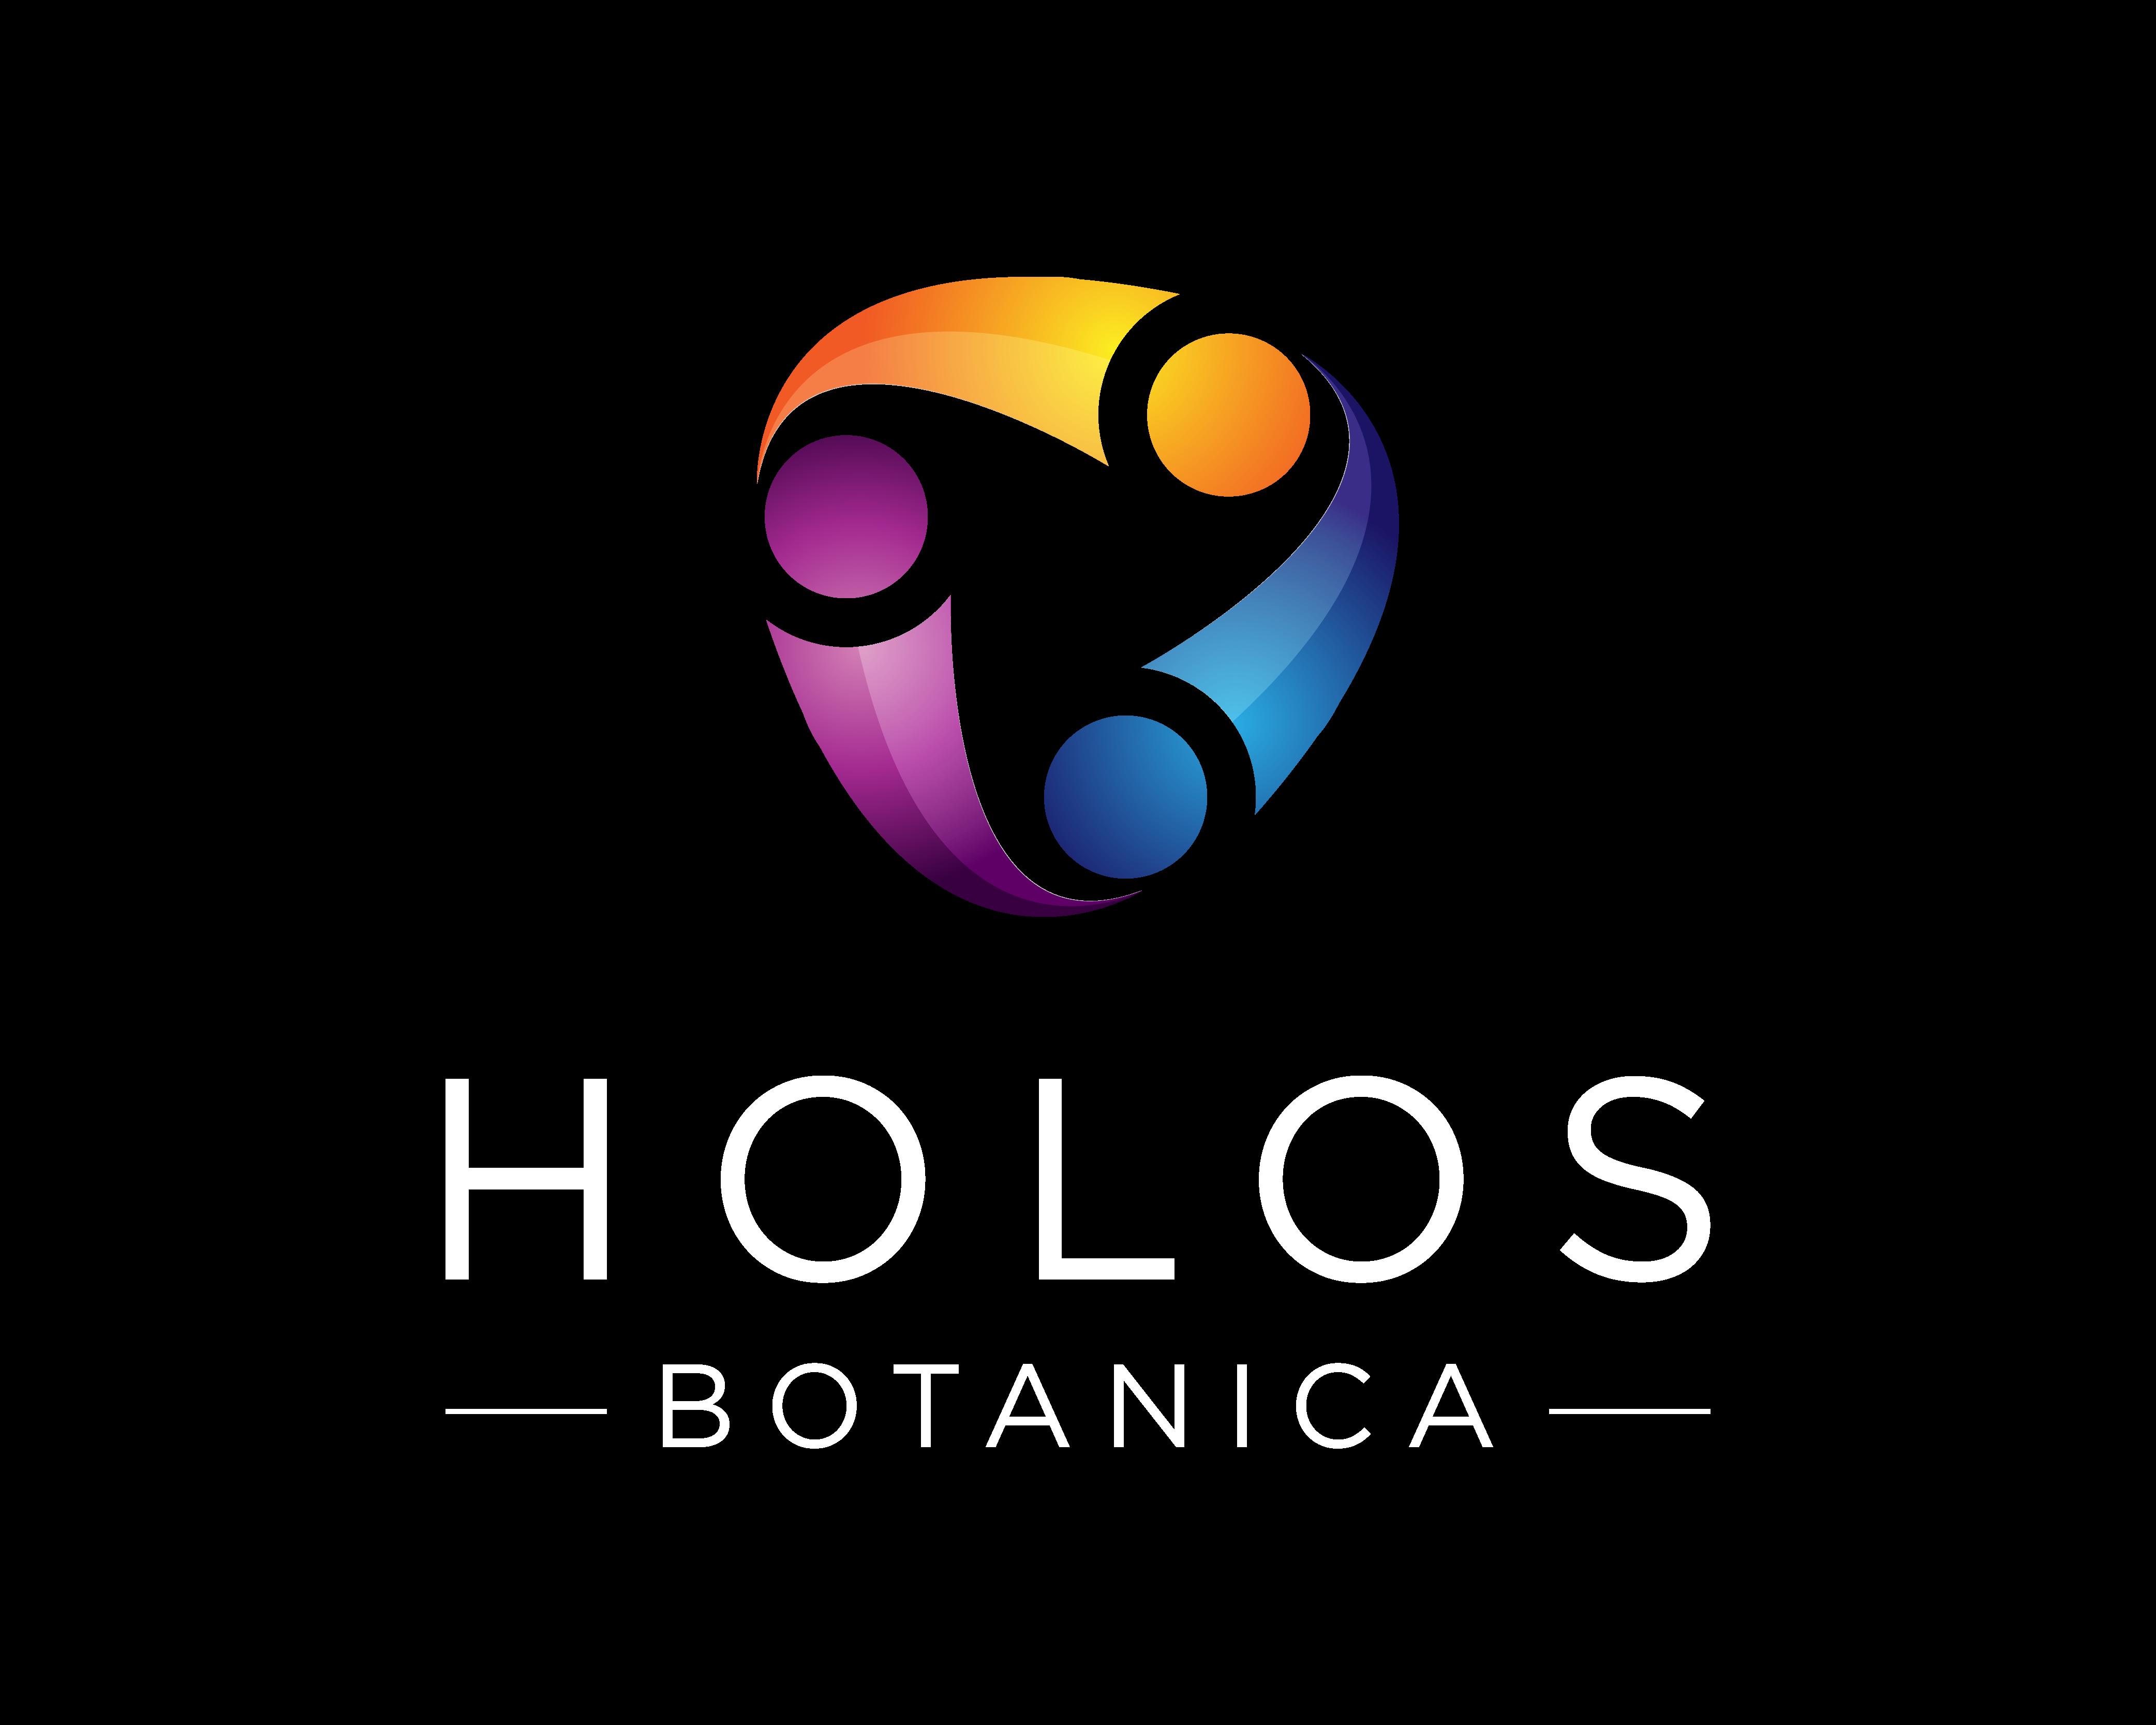 Holos Botanica